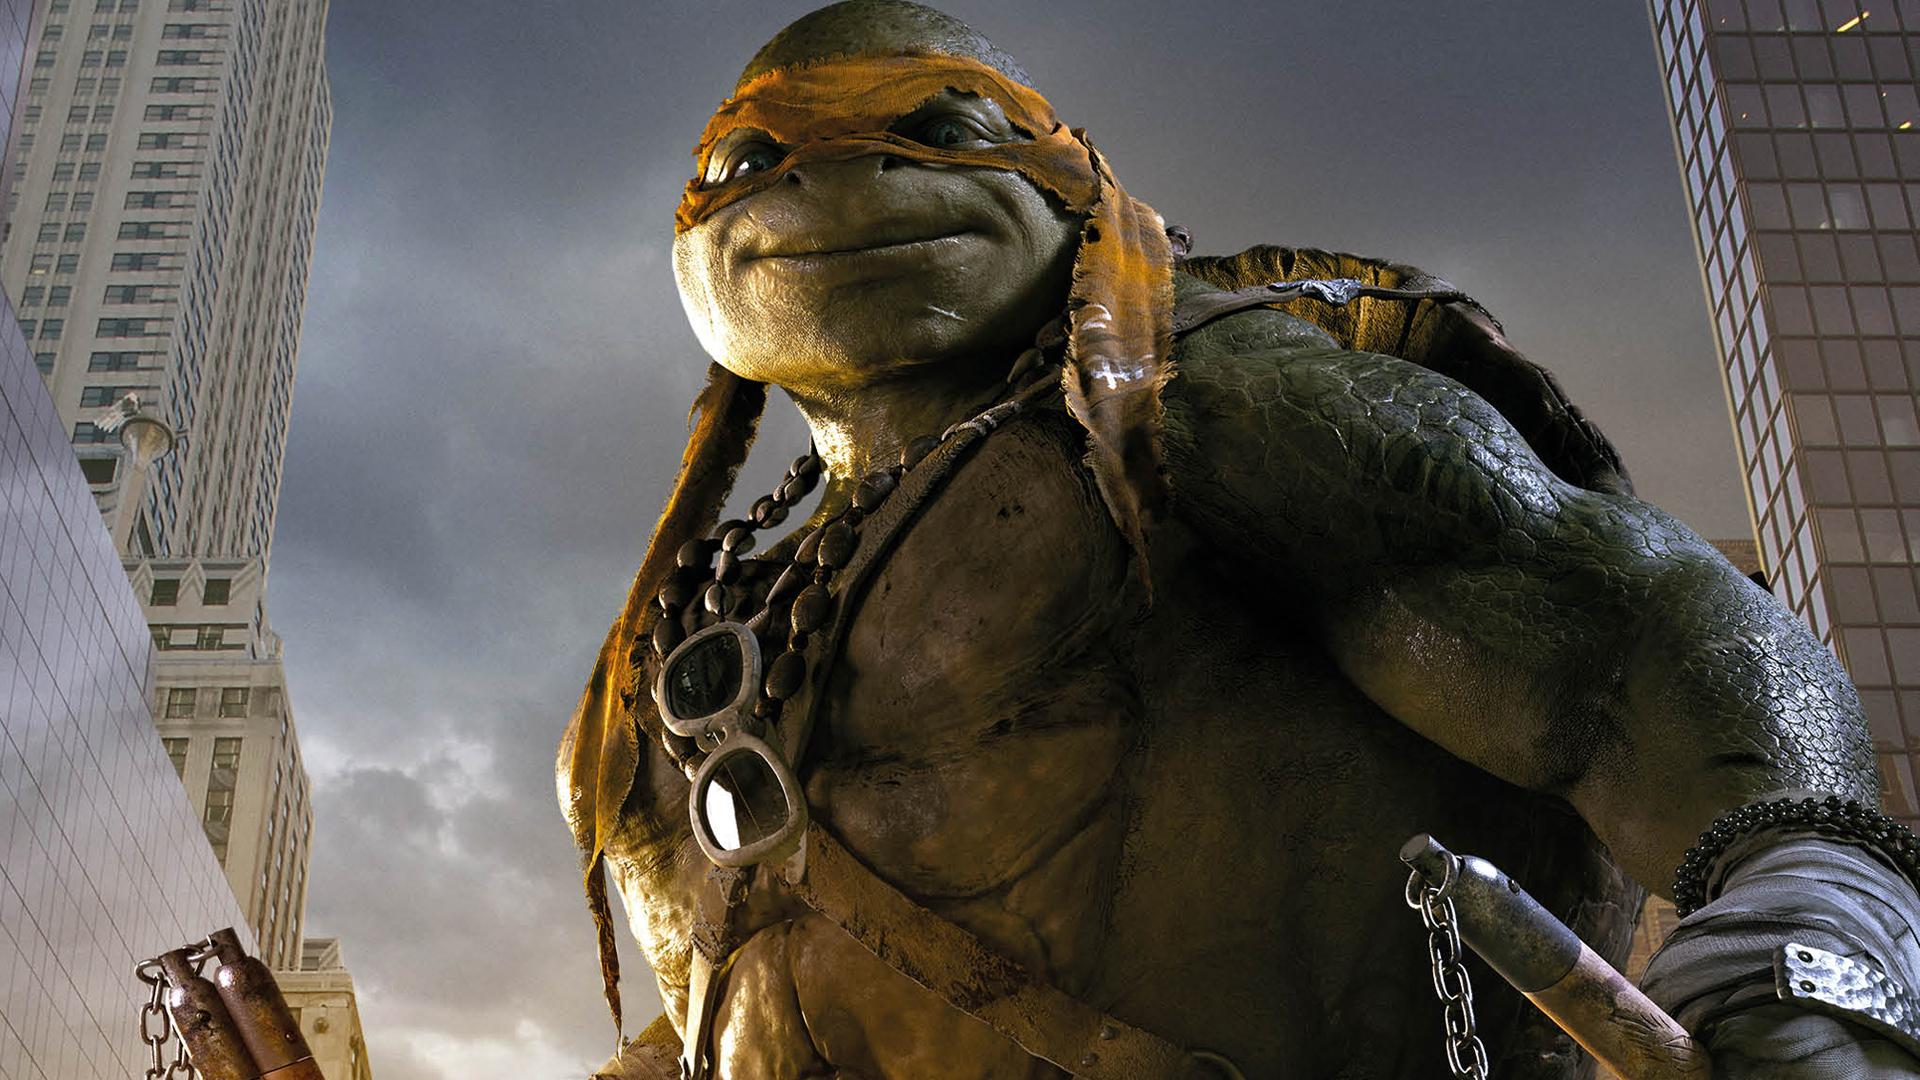 Michelangelo TMNT 2014 Wallpaper HD